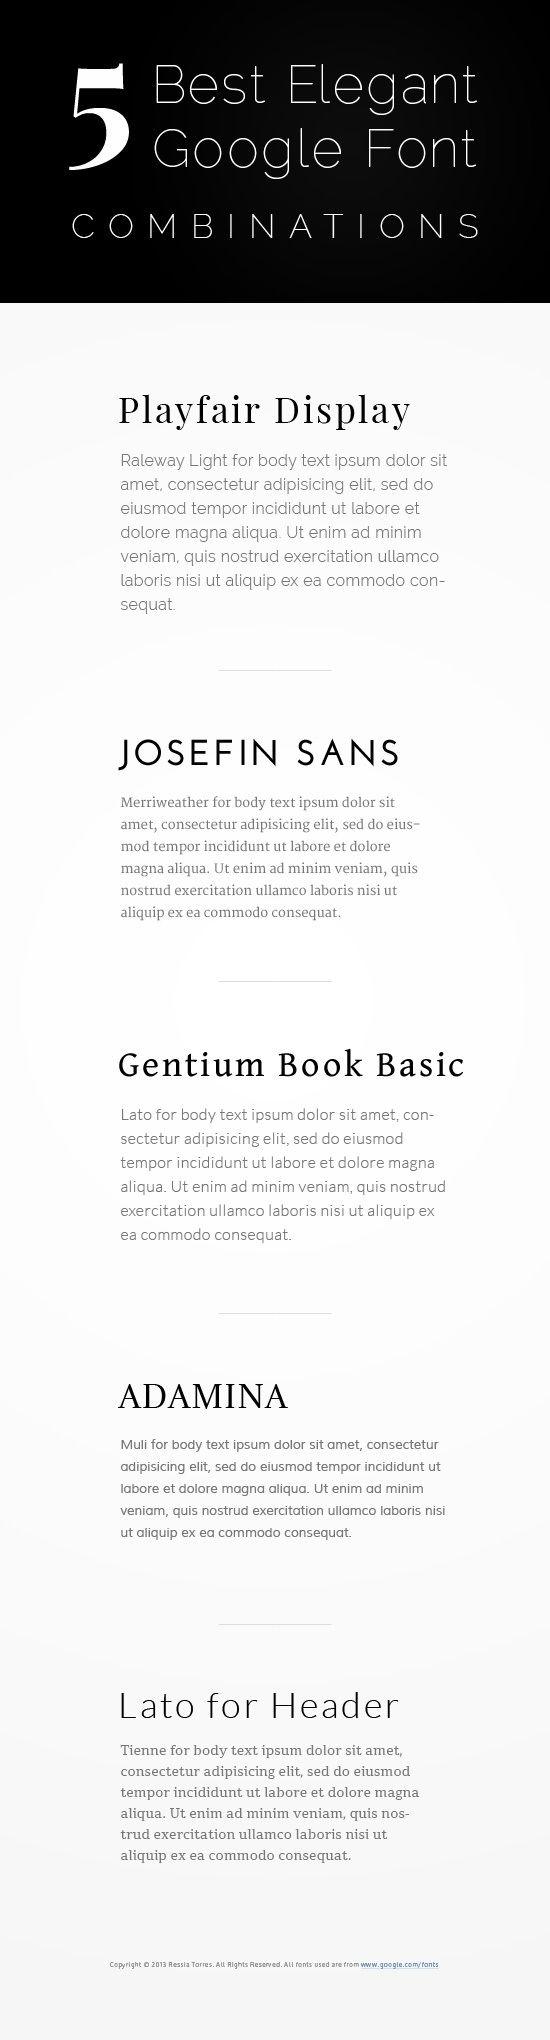 5 Best Elegant Google Font Combinations « Web Designer's Journey